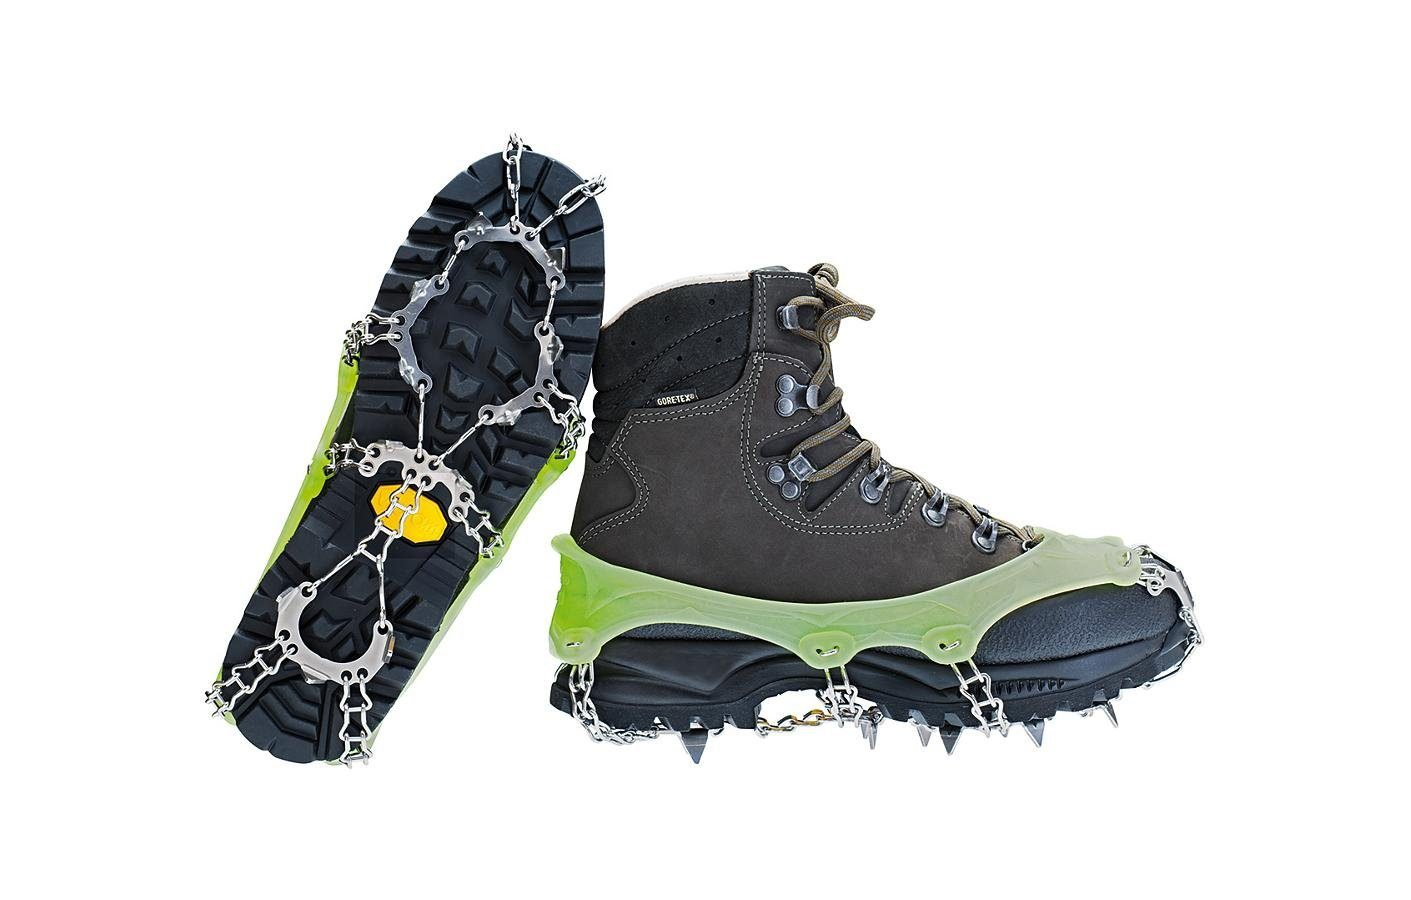 Edelrid Grödel »Spiderpick Crampon Shoes S«